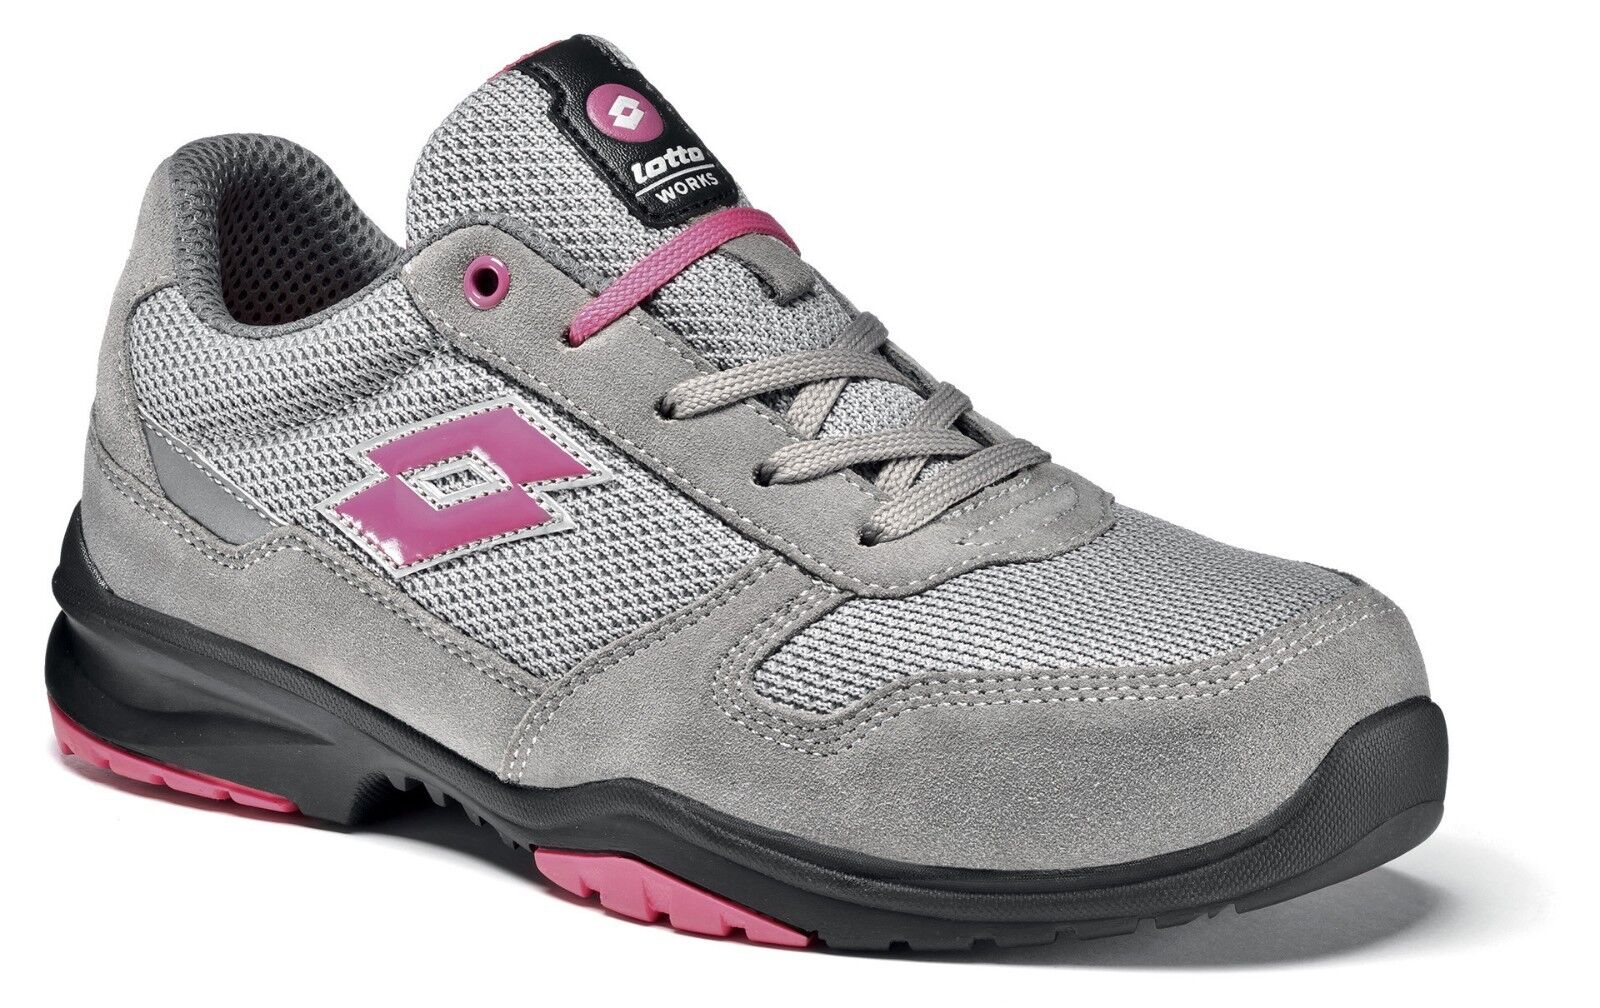 zapatos LAVoro ANTINFORTUNISTICHE LOTTO WORKS FLEX EVO 500 S1205 mujer S1P mujer S1205 OFFERT 9623d8